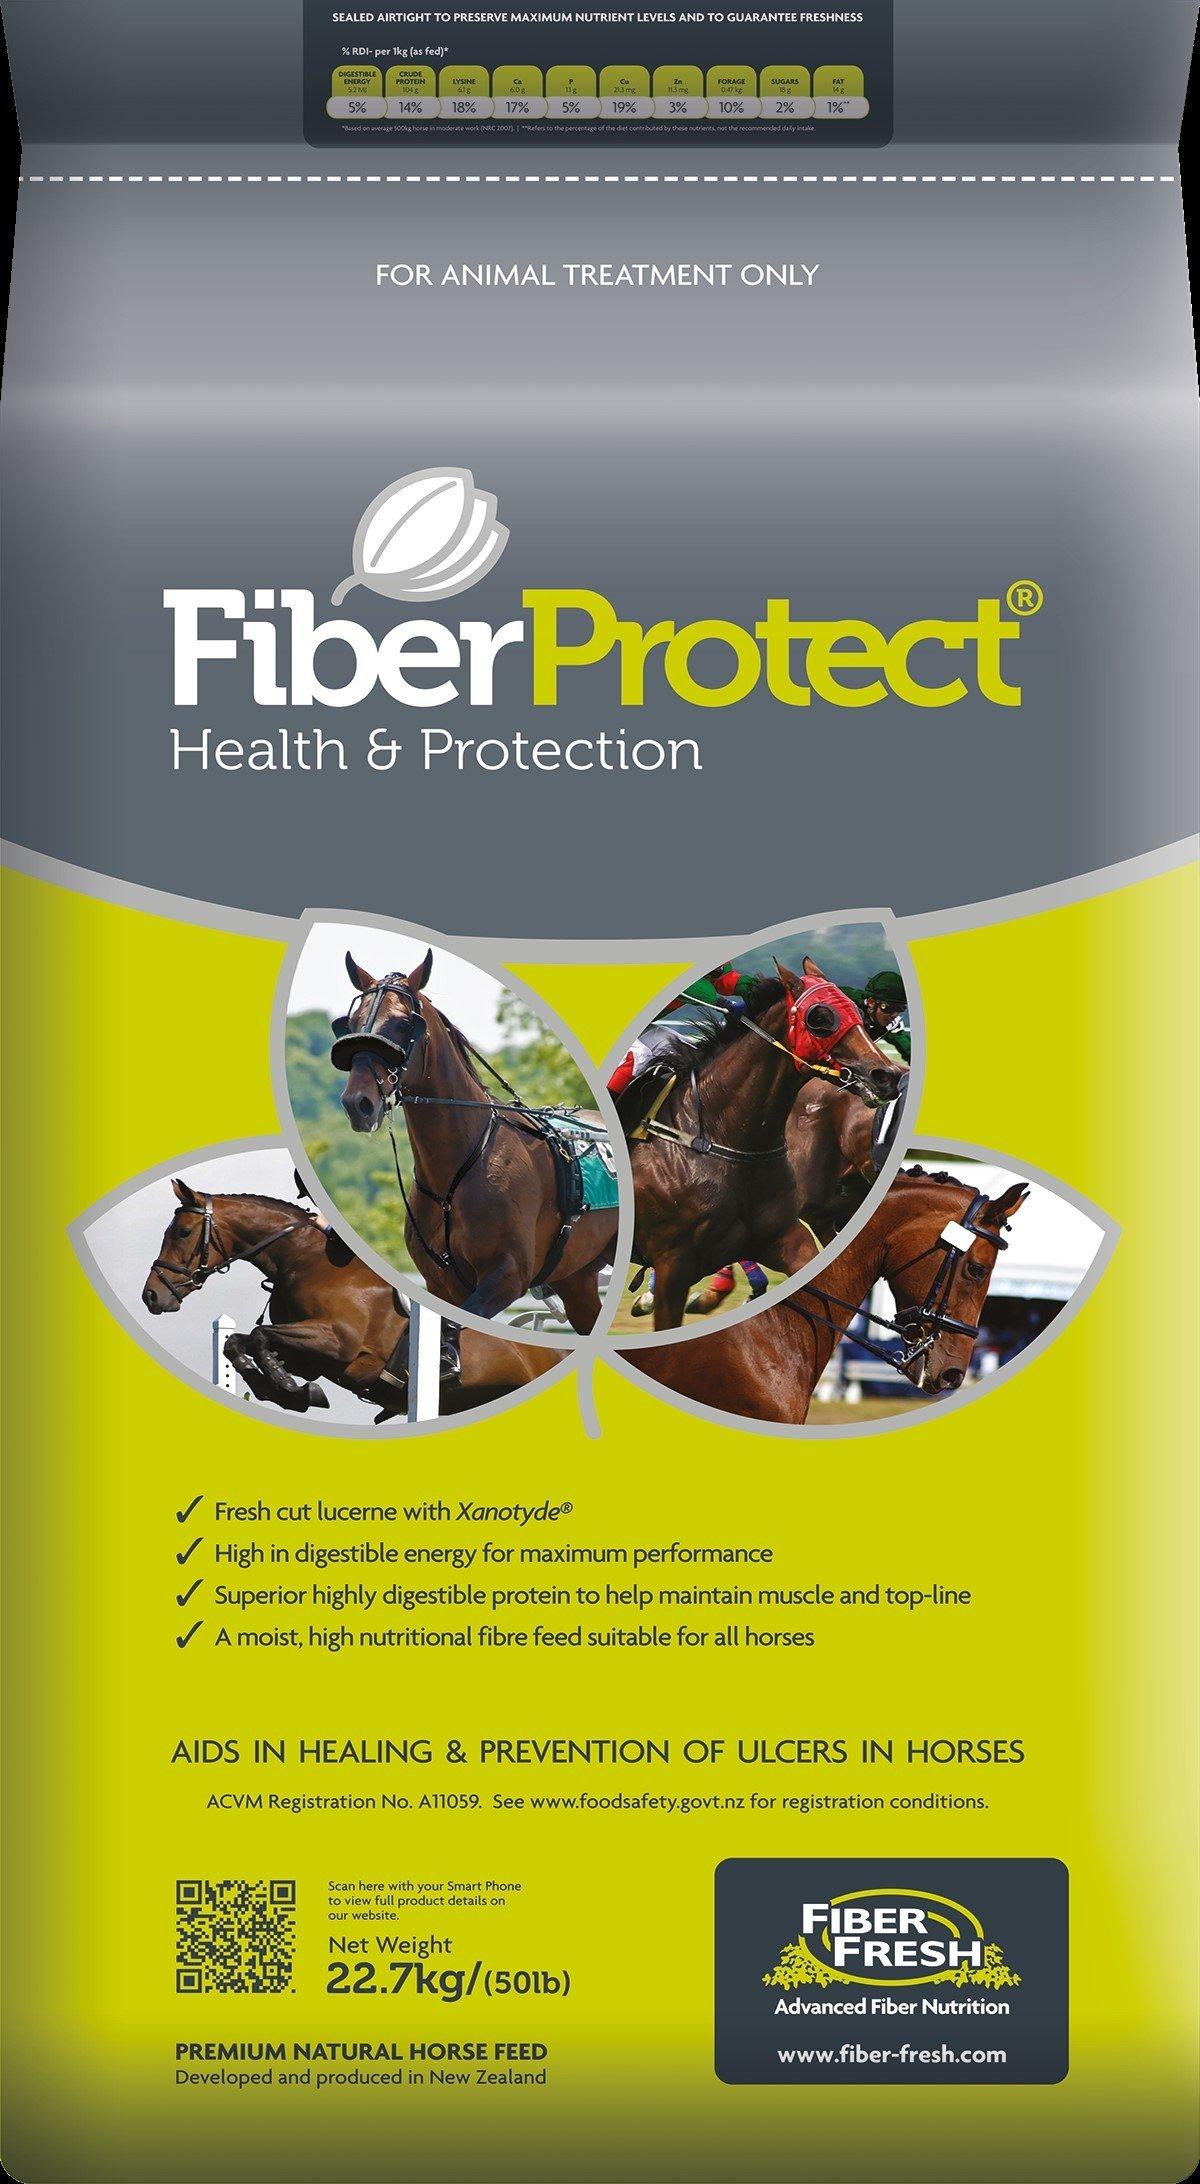 Fiber Protect FPRO